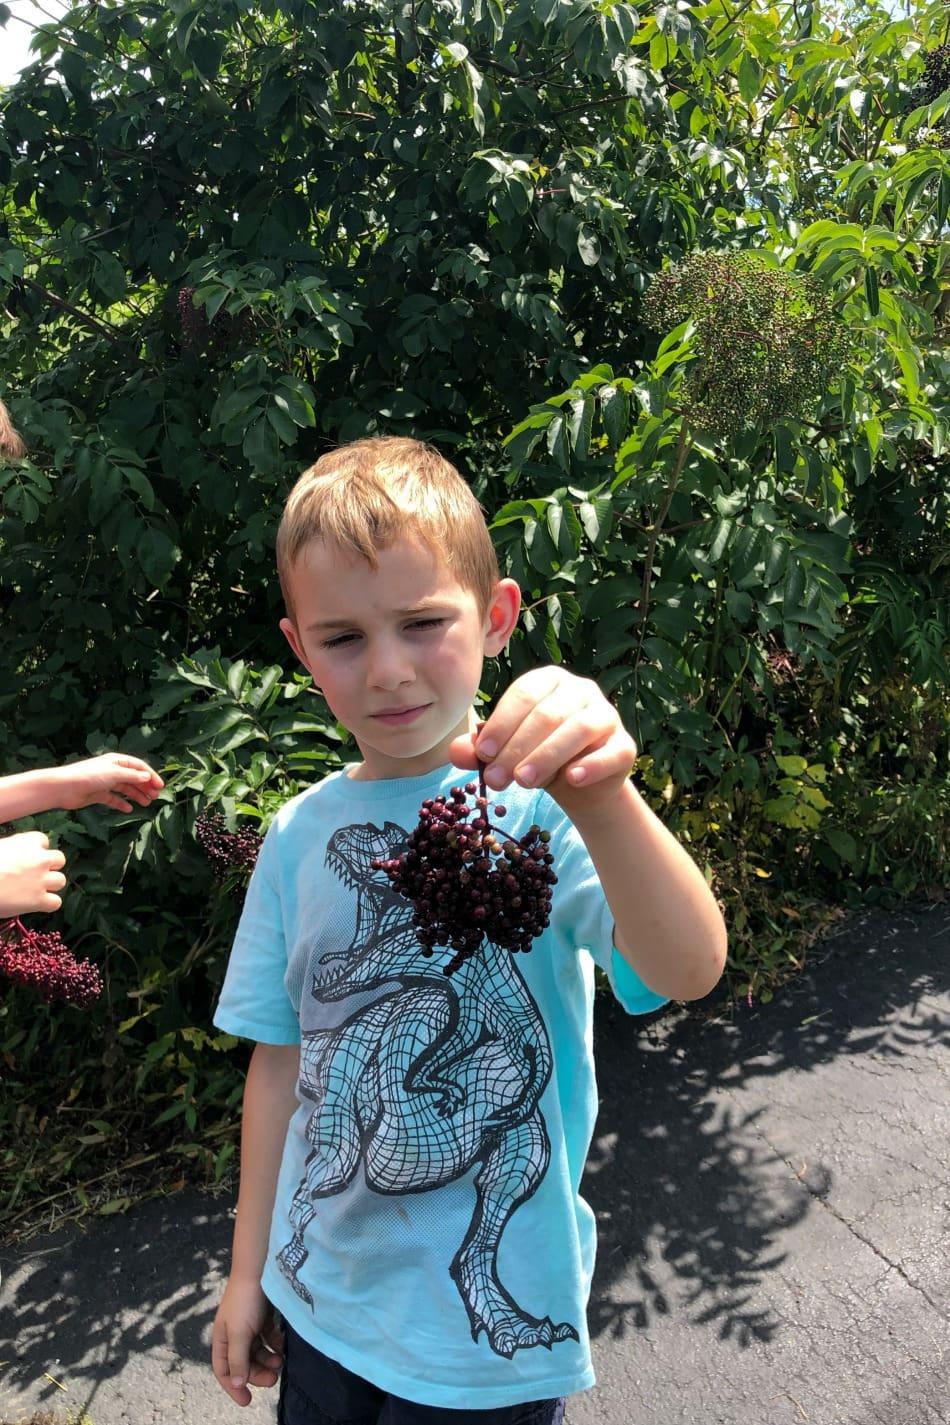 Harvesting & Preserving Elderberries | Growing Up Herbal | It's that time of the year! Elderberry harvesting season! I'm sharing a bit about harvesting and preserving elderberries for future use in this post.